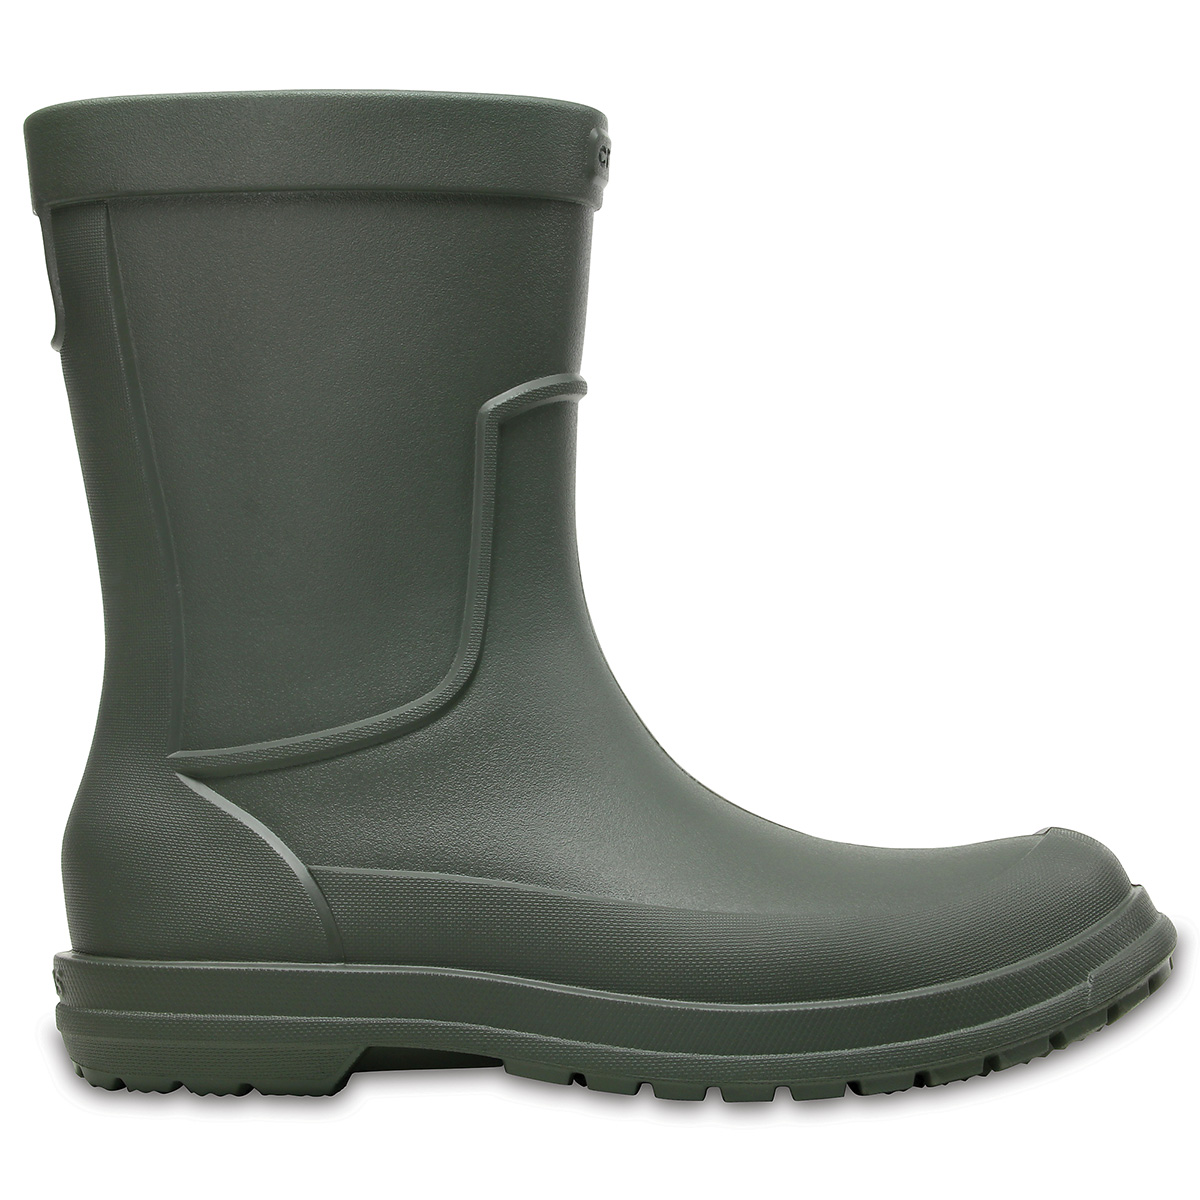 AllCast Rain Boot M - Tozlu Zeytin/Tozlu Zeytin